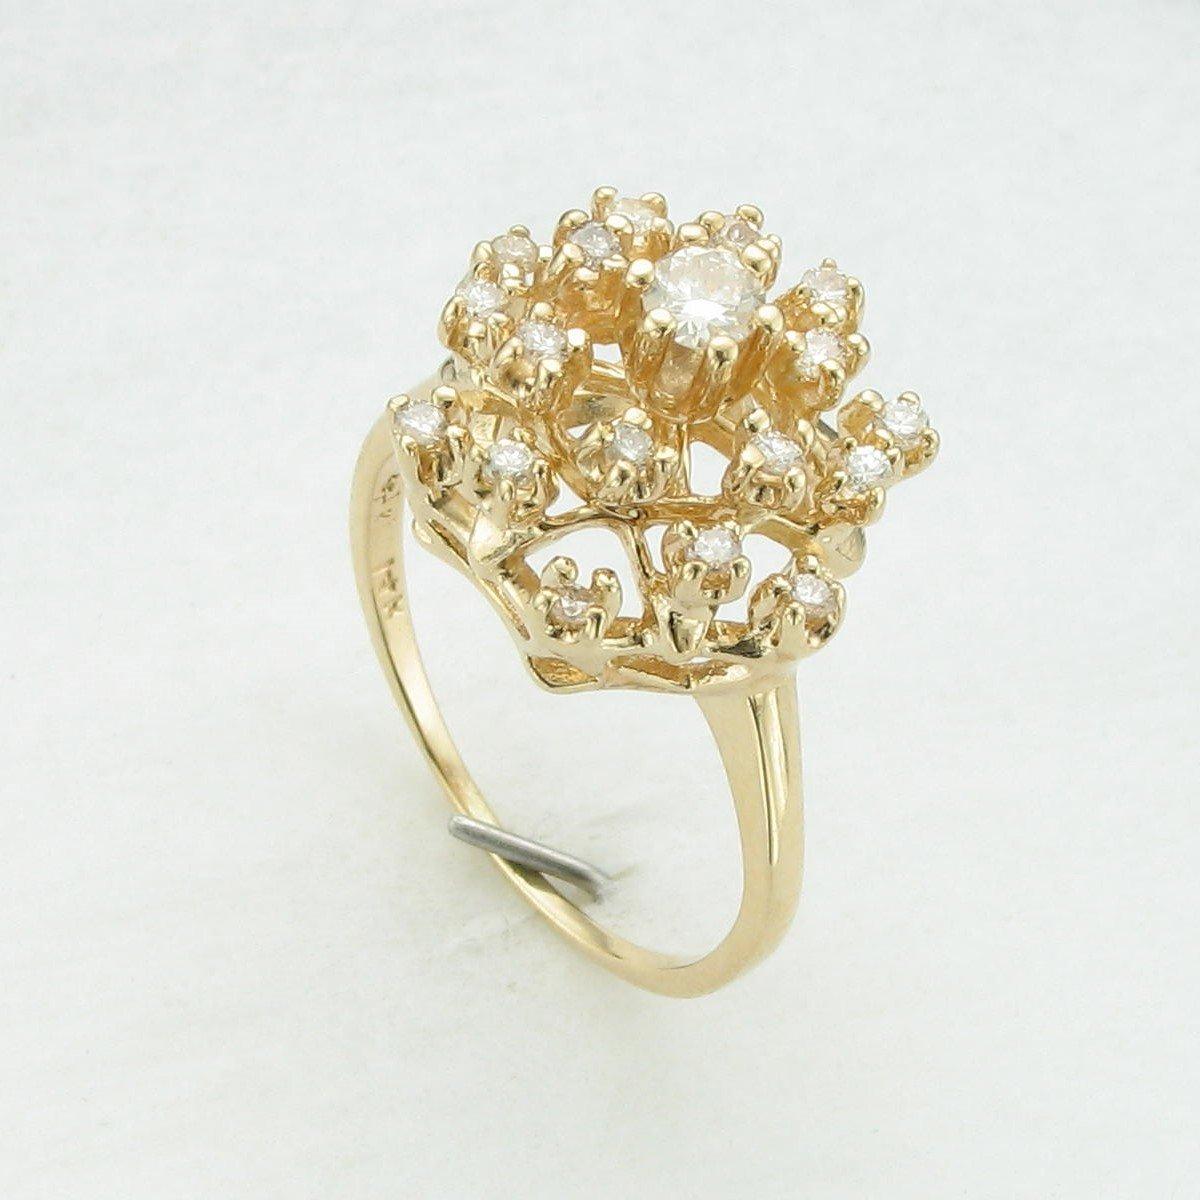 0.25tcw Snowball Diamond Ring in 14k Yellow Gold